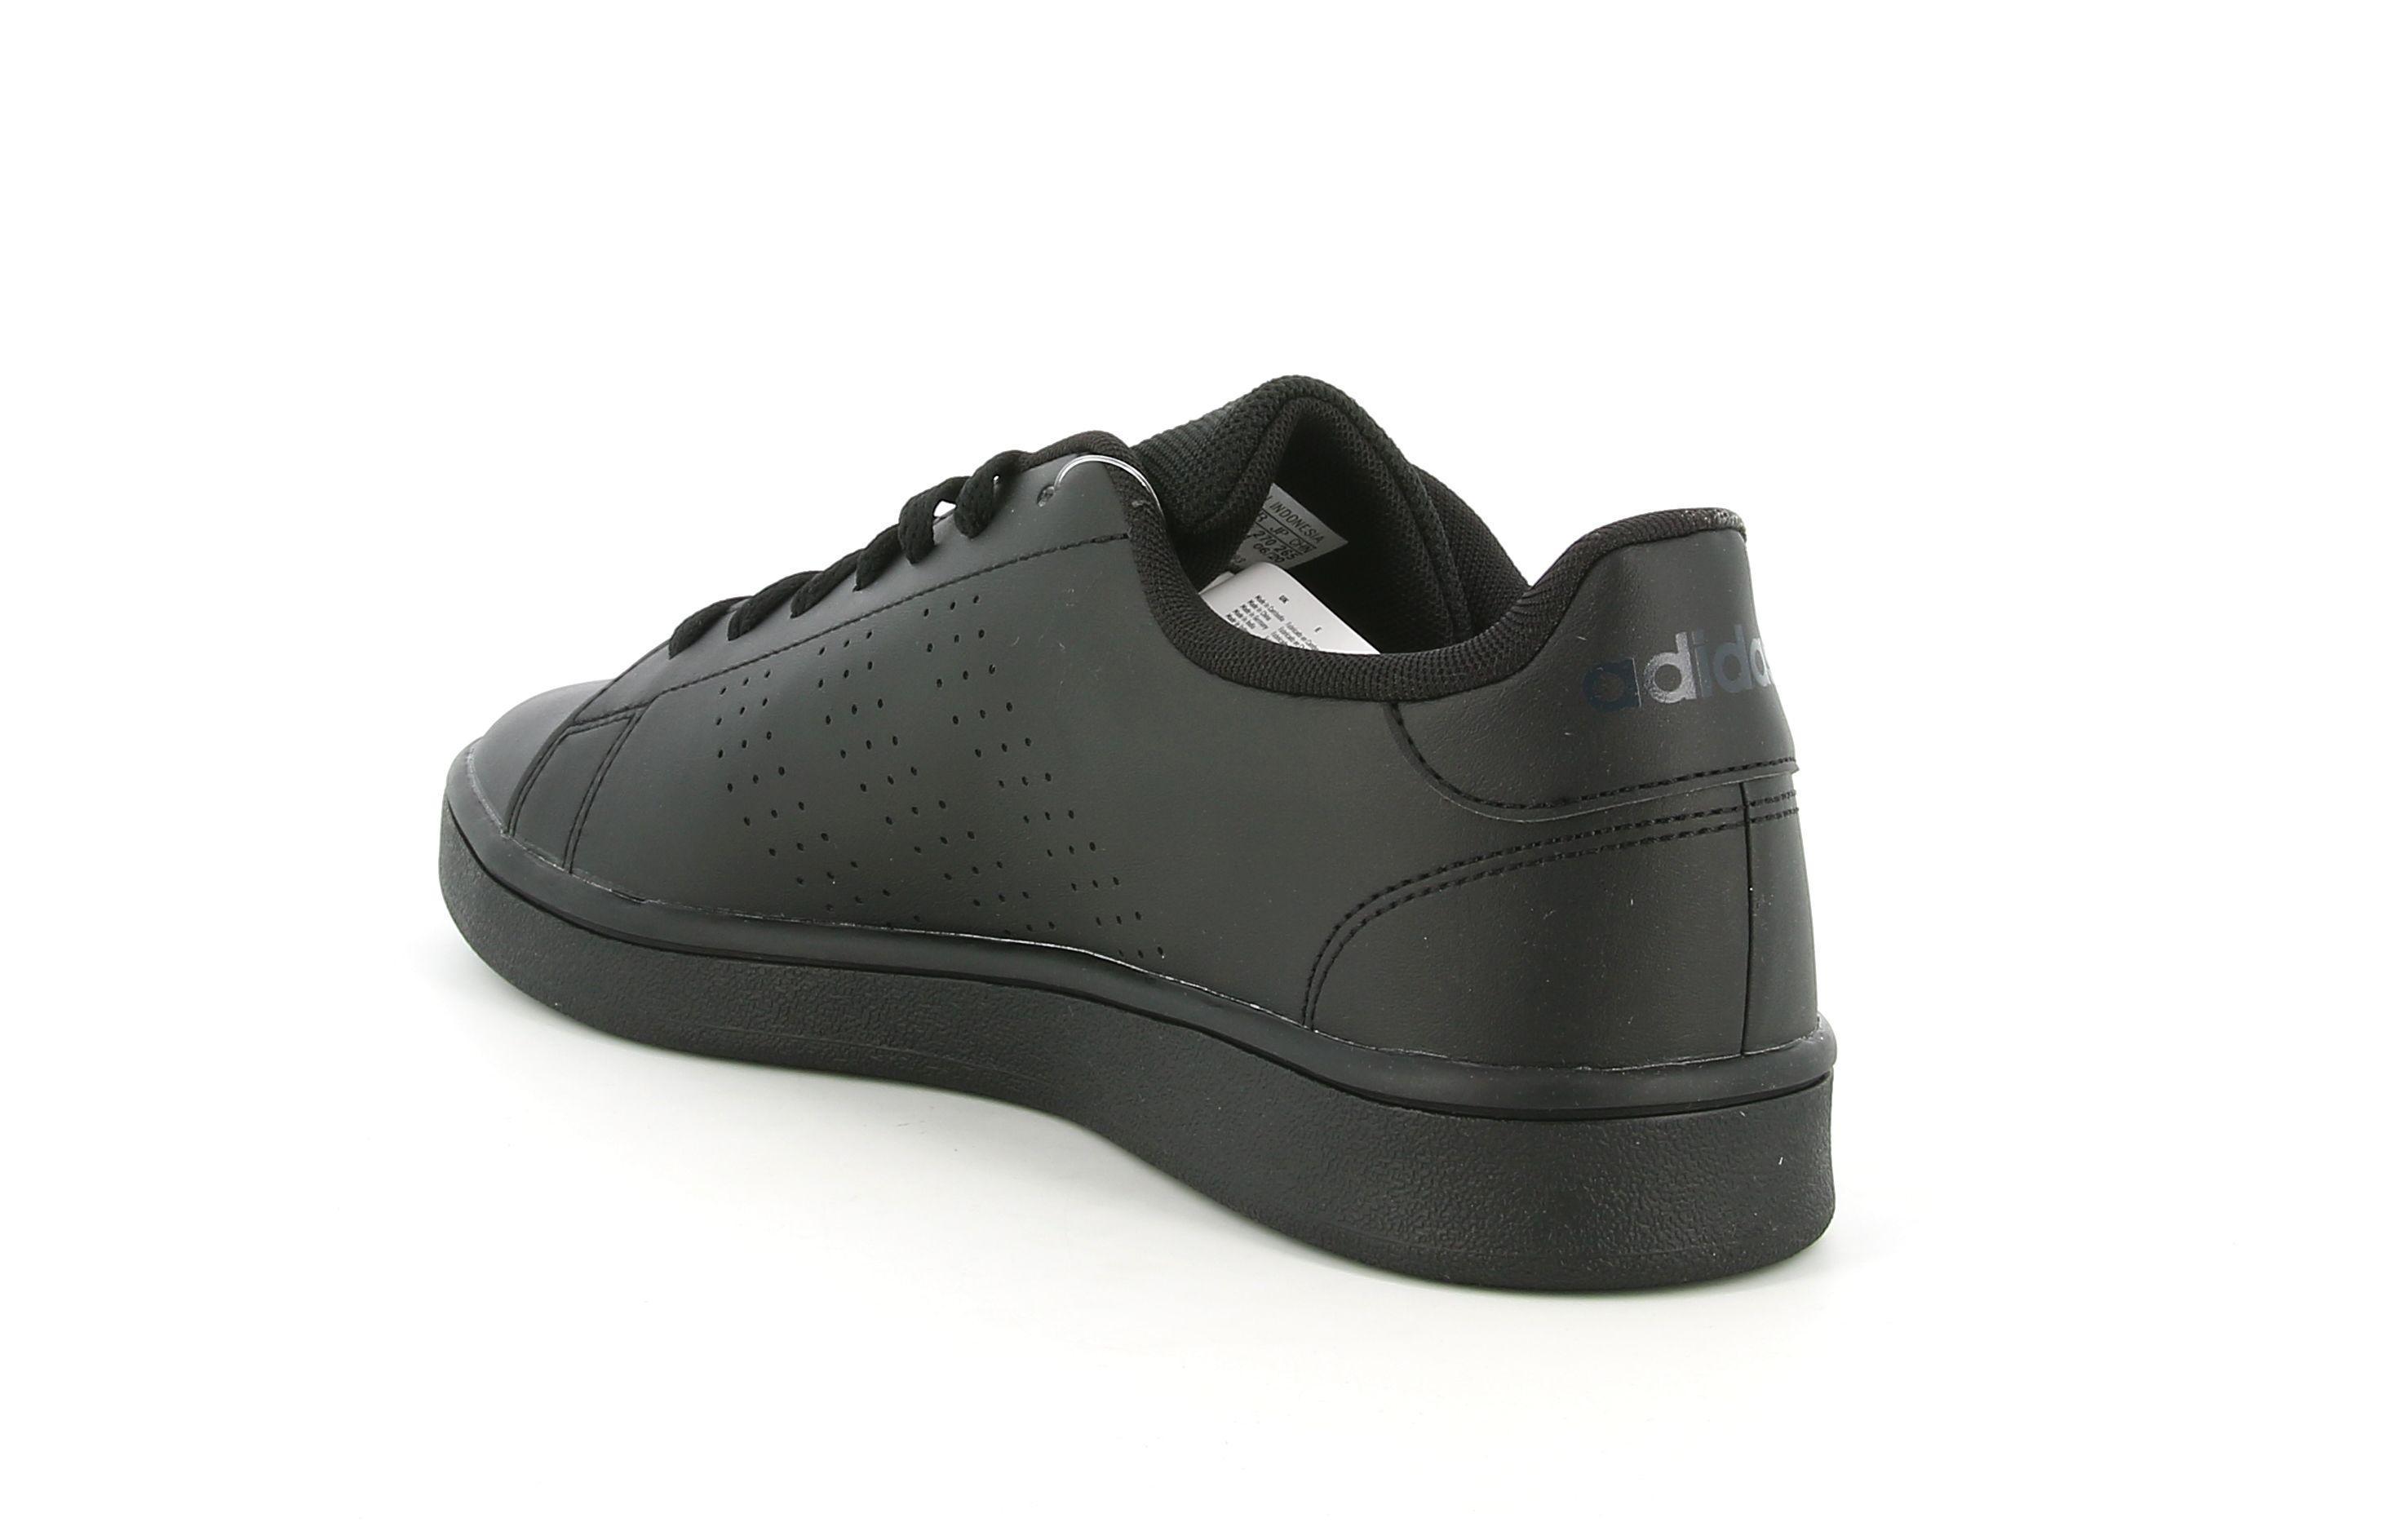 adidas adidas ee7693 advantage base cblack/gresix sneakers bassa uomo nero